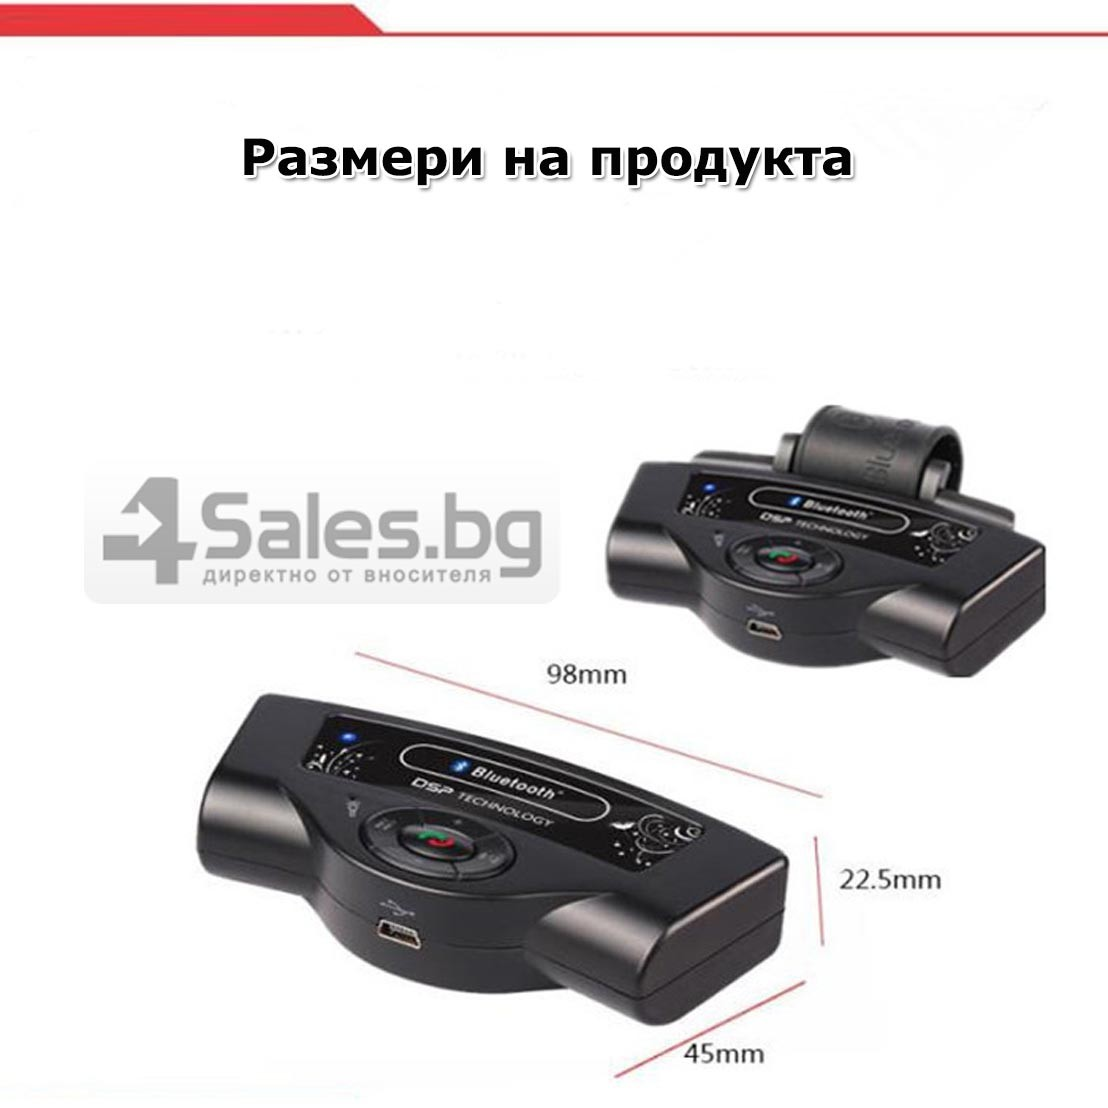 Bluetooth handsfree свободни ръце за волан на автомобил с високоговорител HF1 12